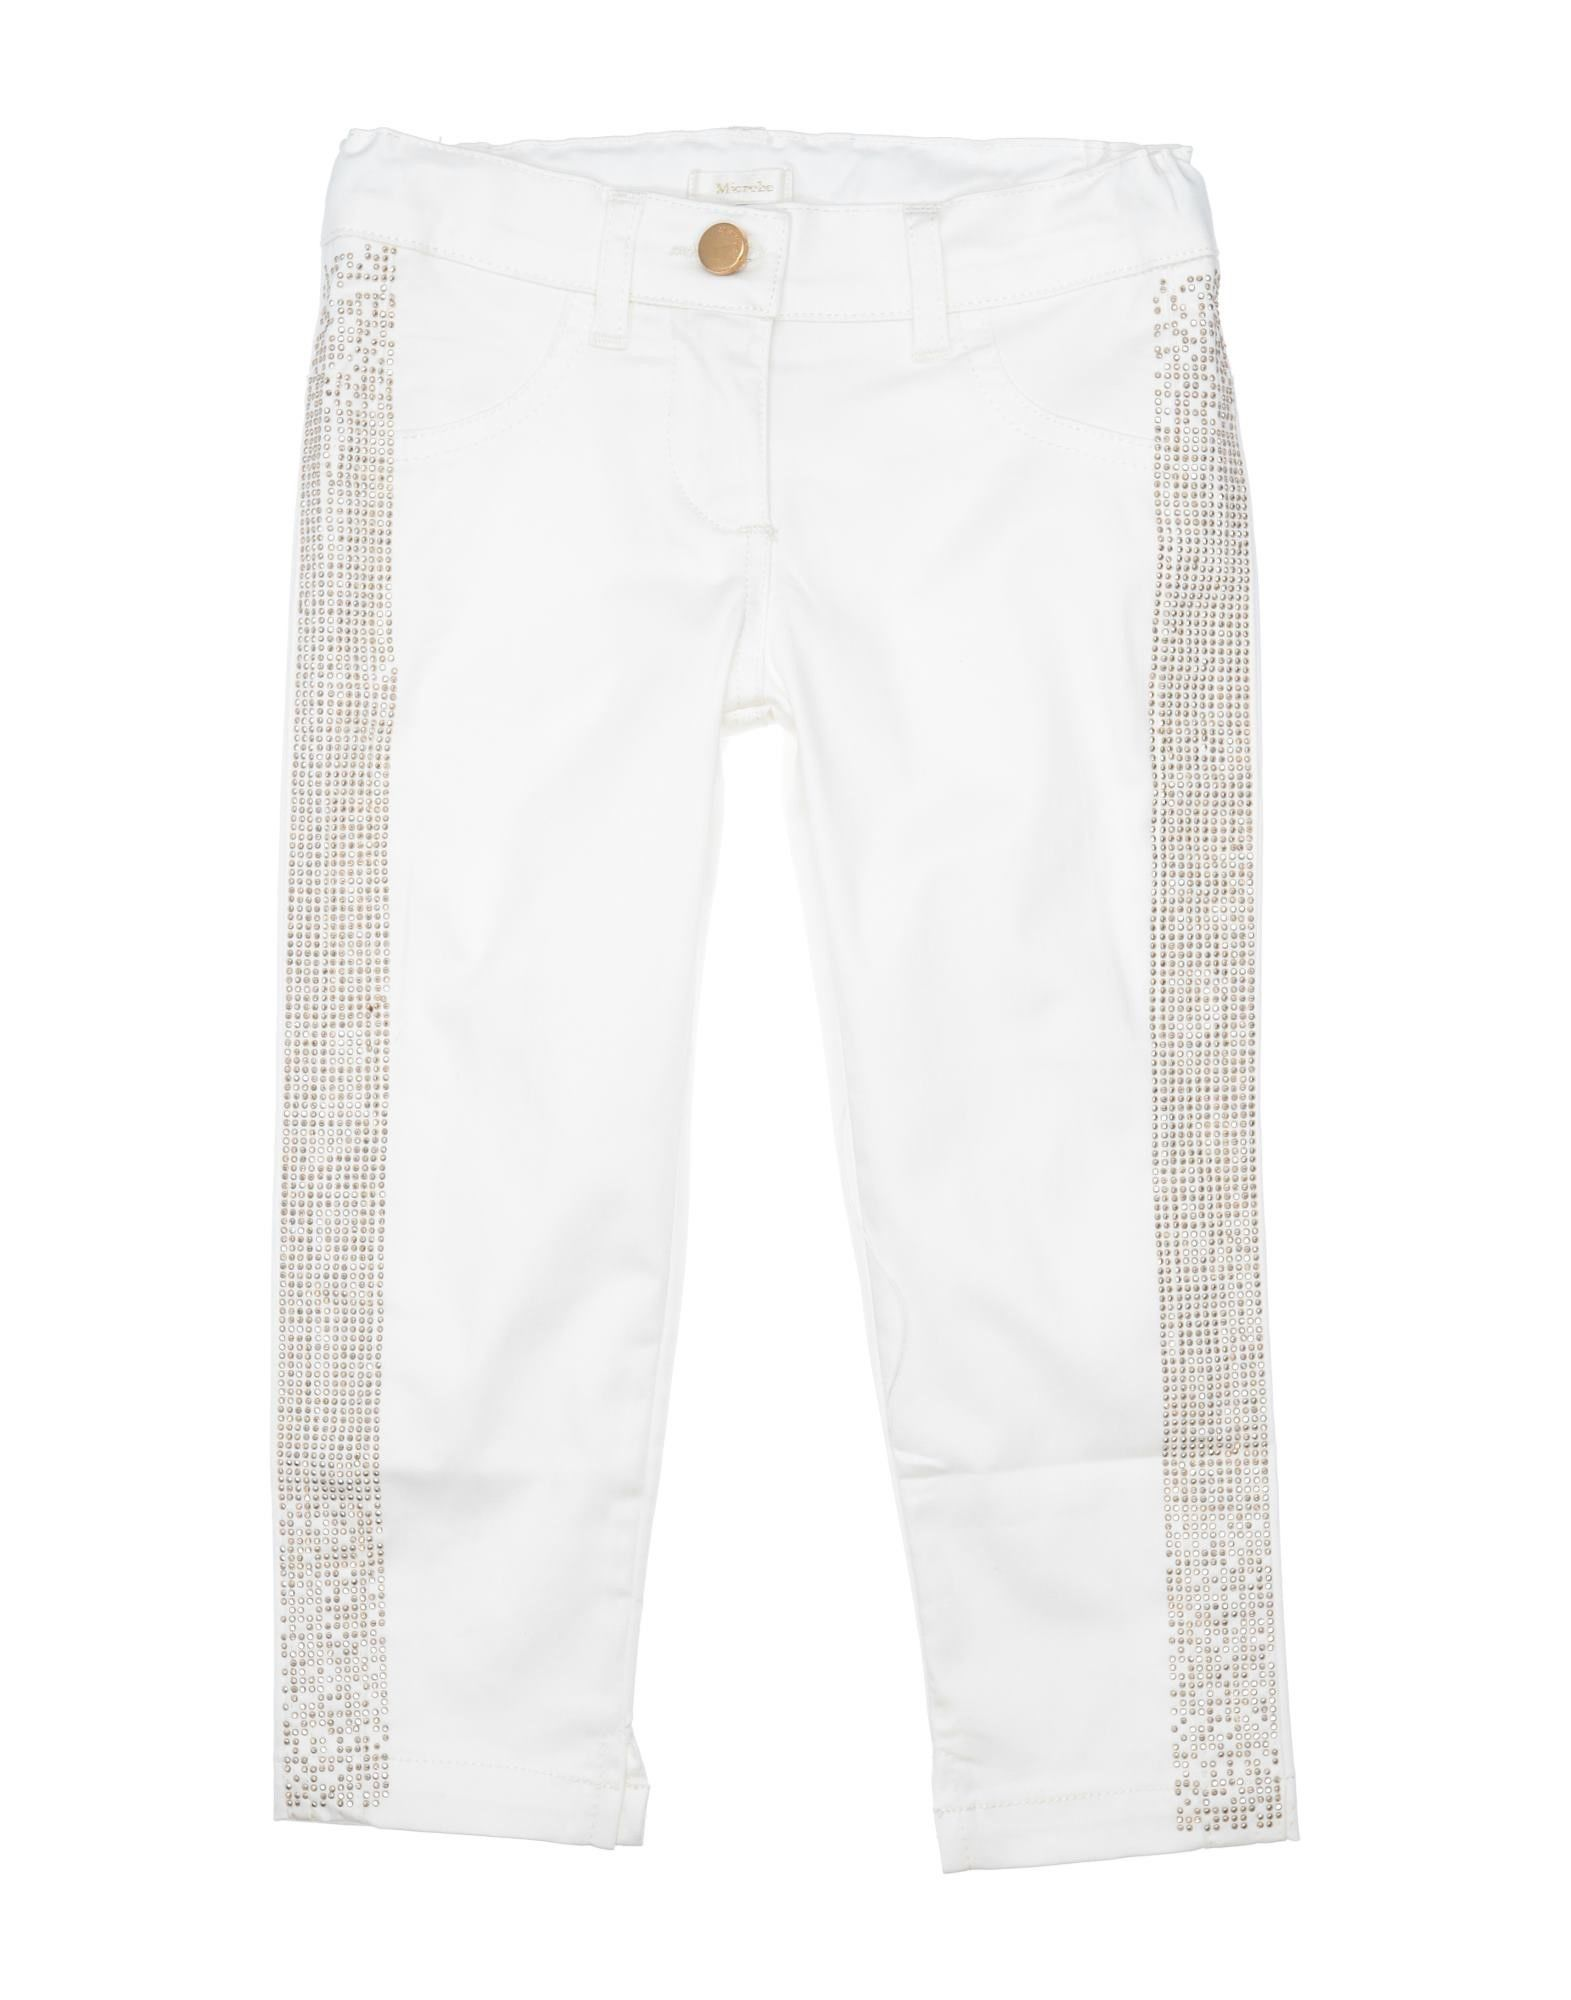 Фото - MICROBE by MISS GRANT Повседневные брюки microbe by miss grant джинсовая верхняя одежда